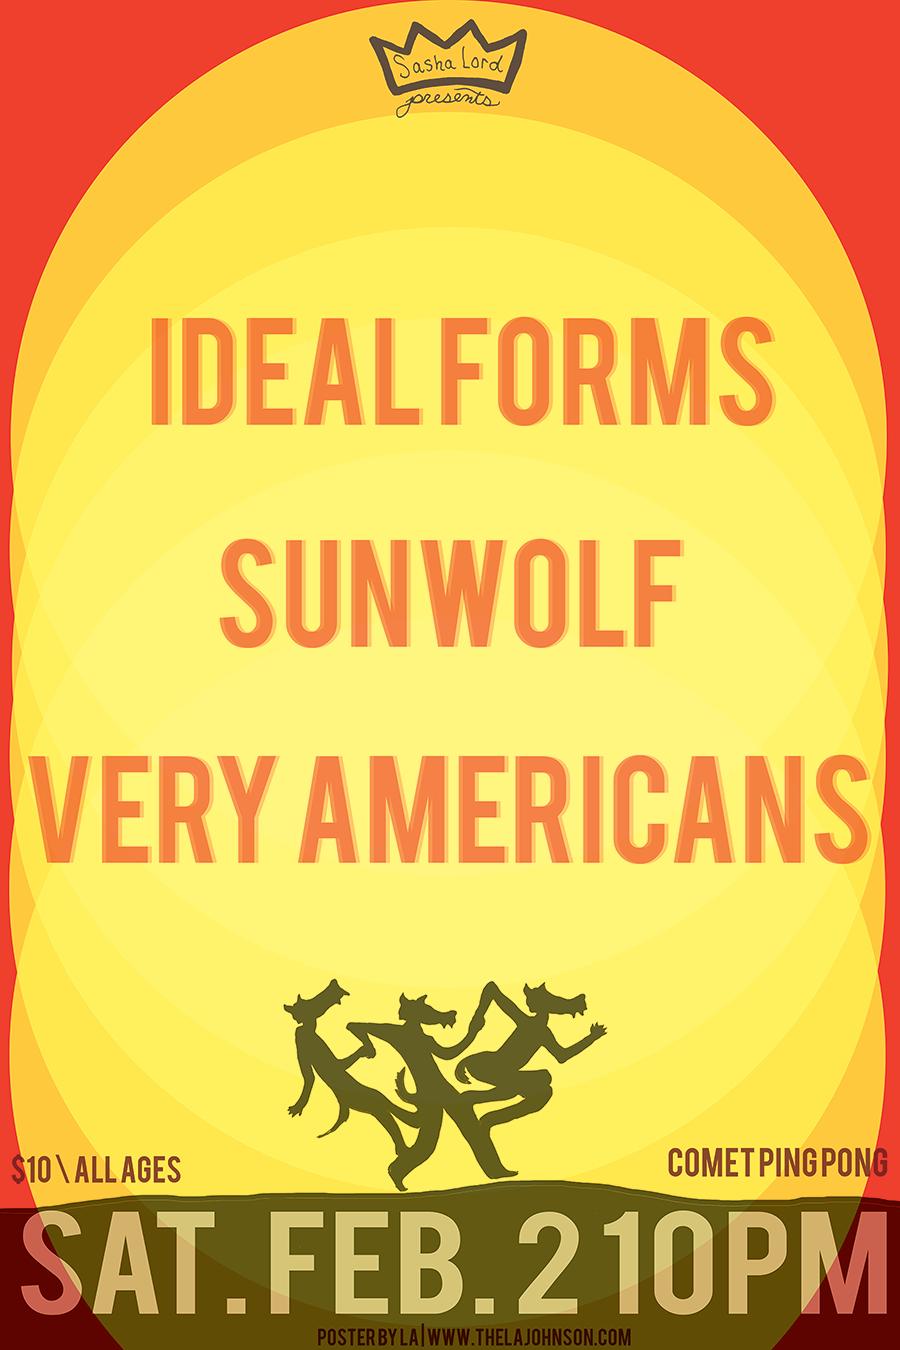 slp-sunwolf2013-web.png